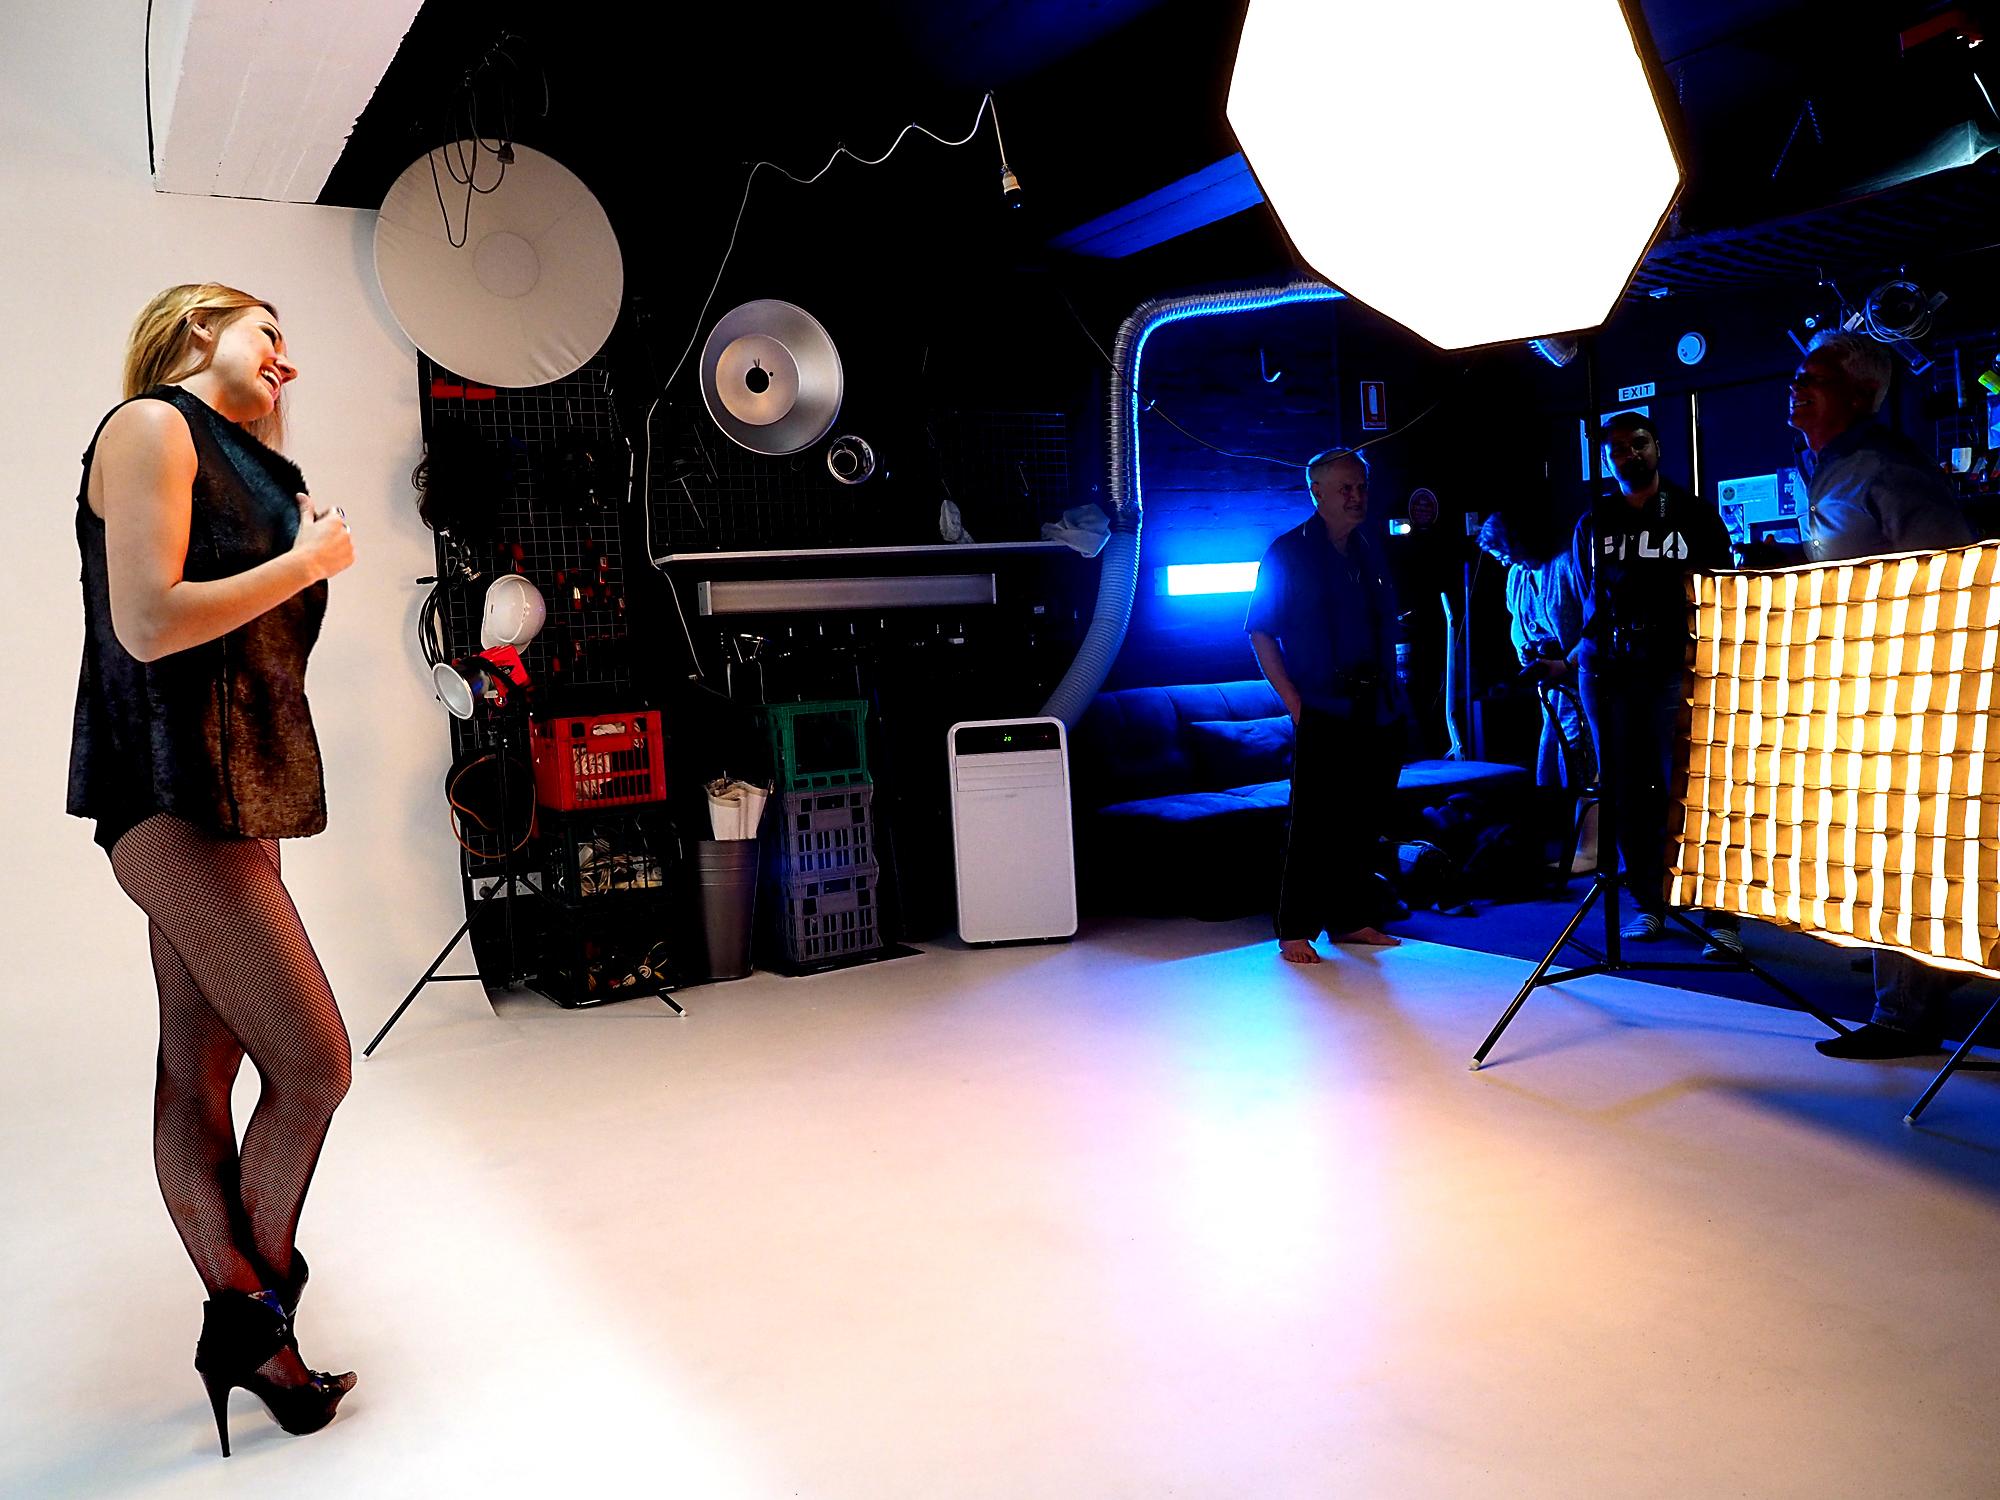 Fashion Posing-Yana291017 (16 of 36).jpg